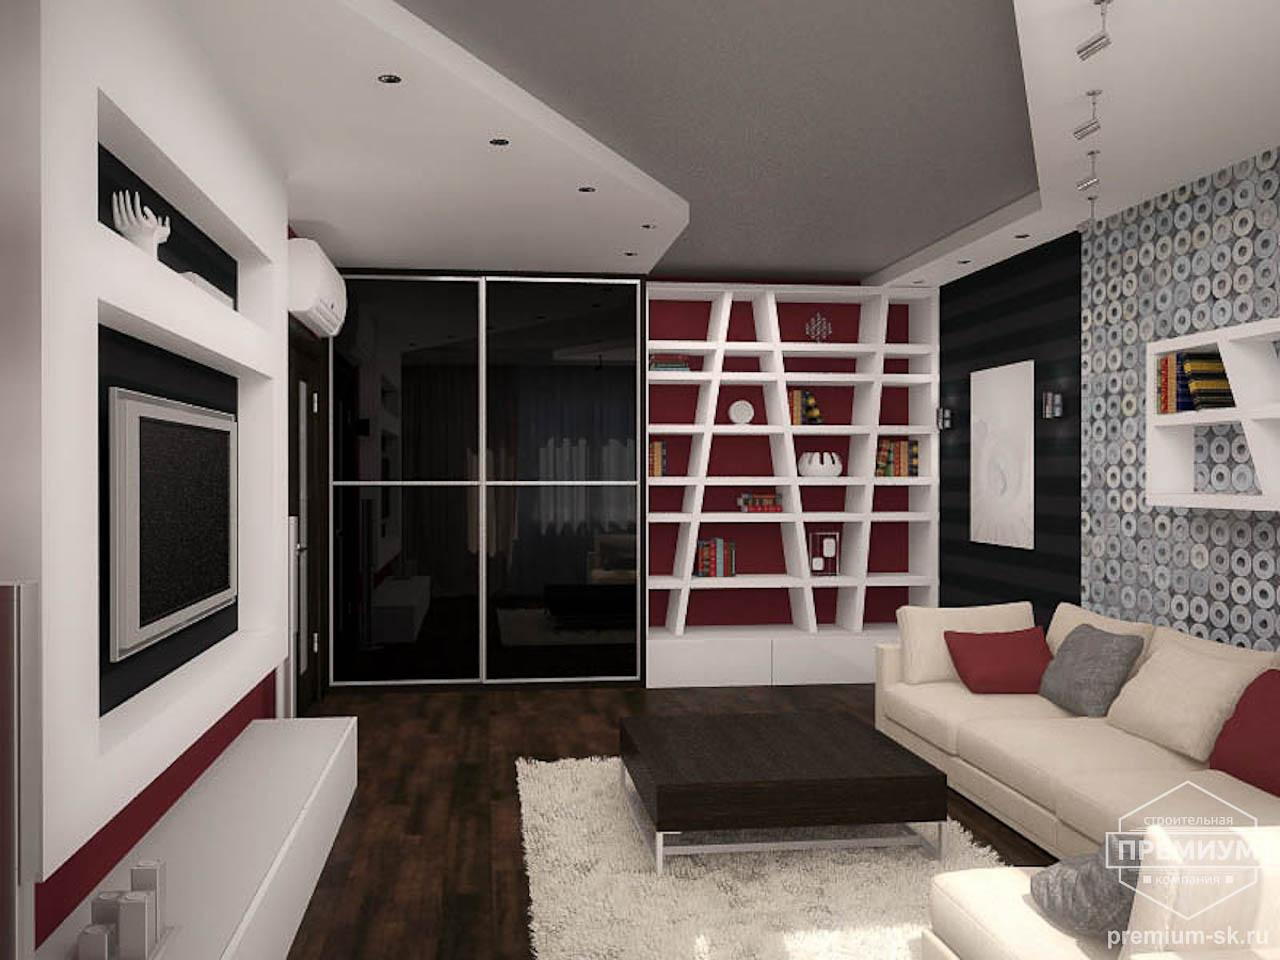 Дизайн интерьера однокомнатной квартиры по ул. Сыромолотова 11 img900215976